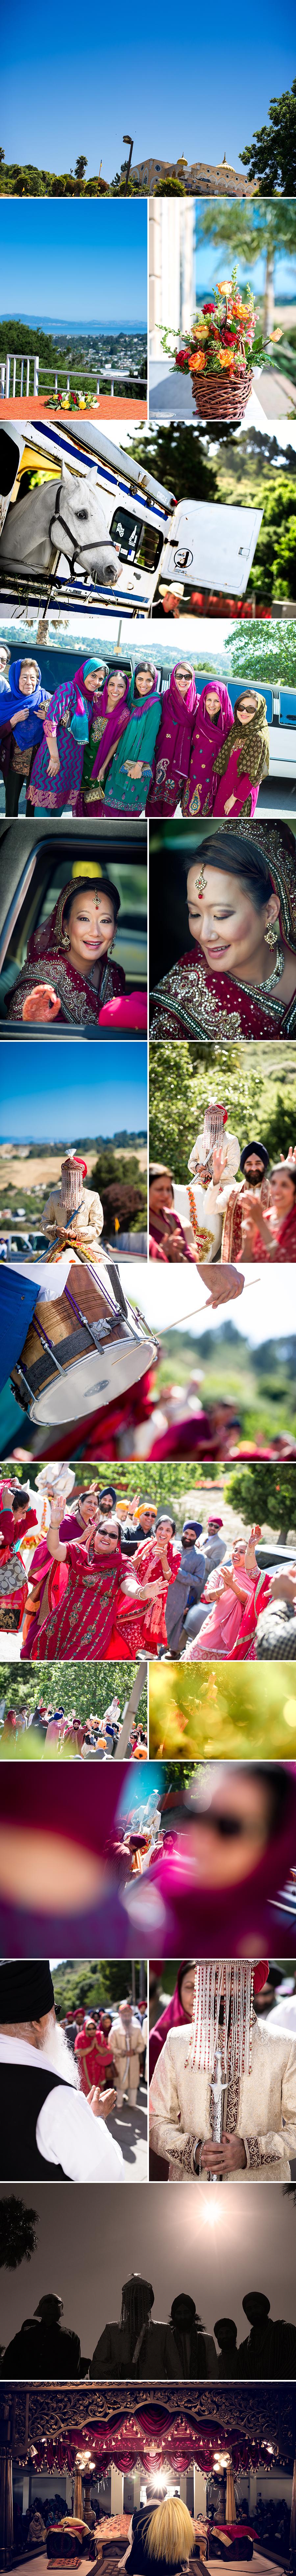 Indian Sikh wedding El Sobrante Gurudwara